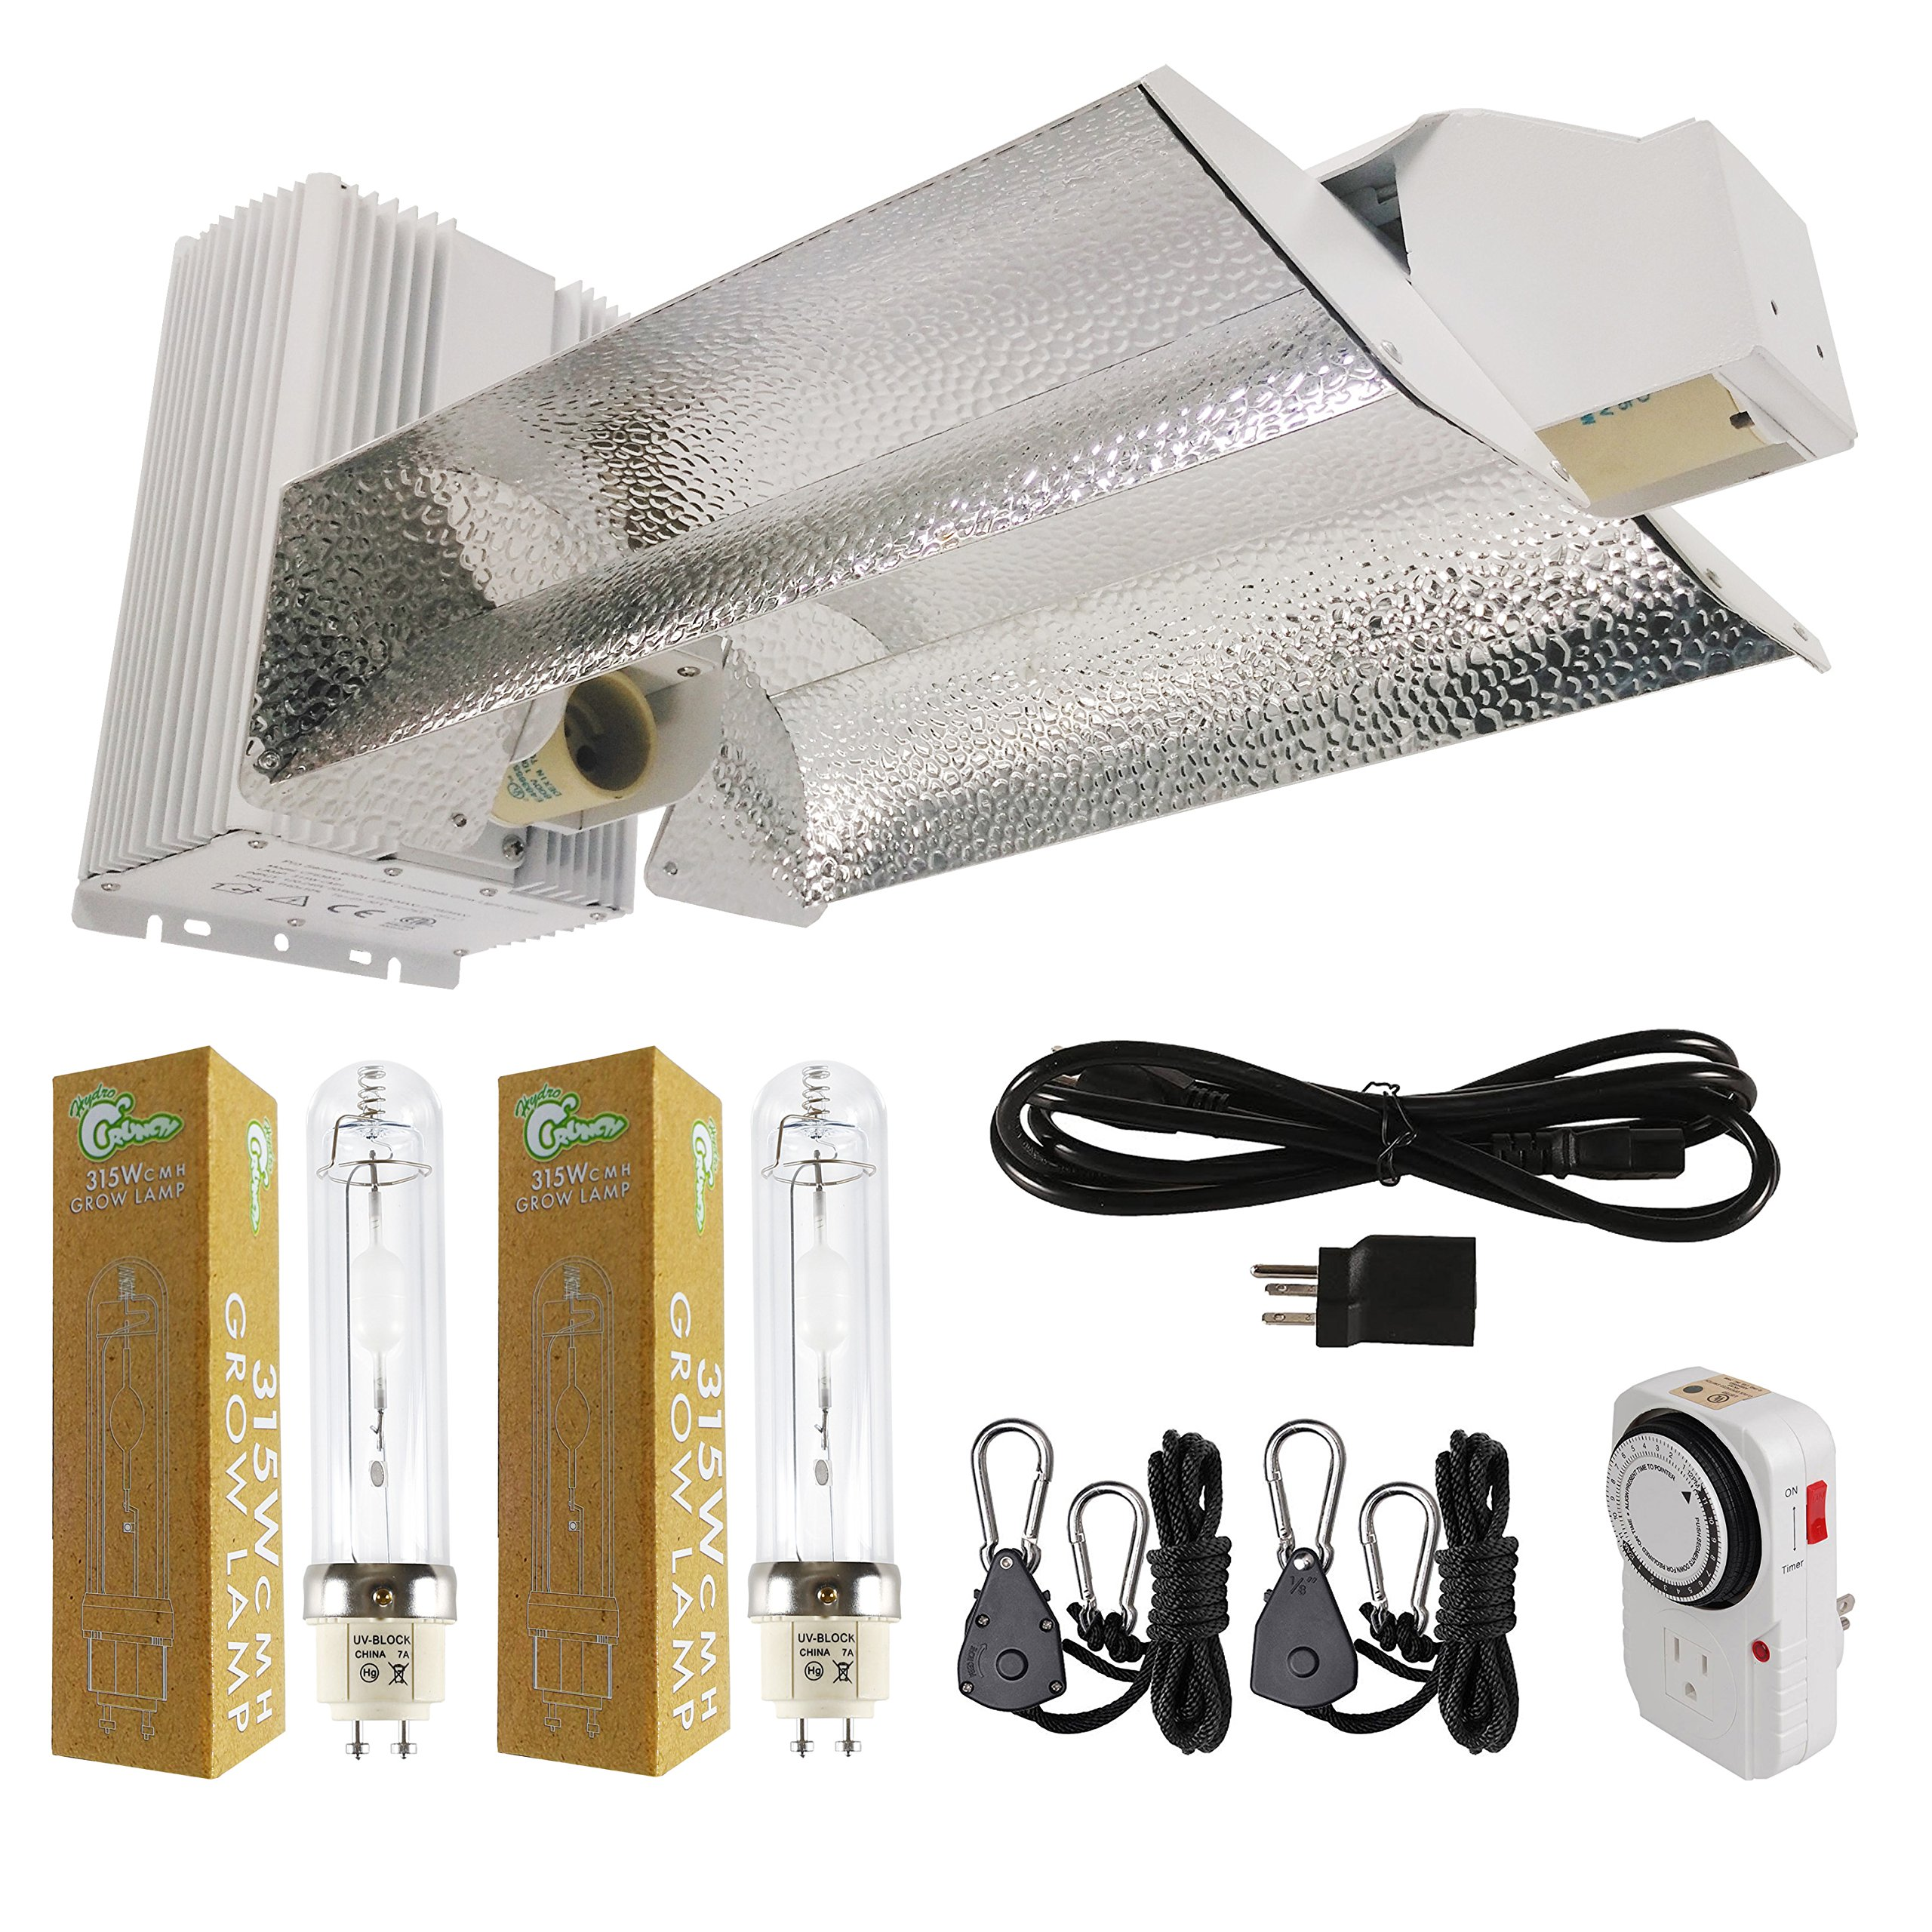 Hydro Crunch NB379900111-KIT 630-Watt Ceramic Metal Halide CMH Dual Lamp Open Style Complete Grow Light System with 3100K Full Spectrum Bulbs